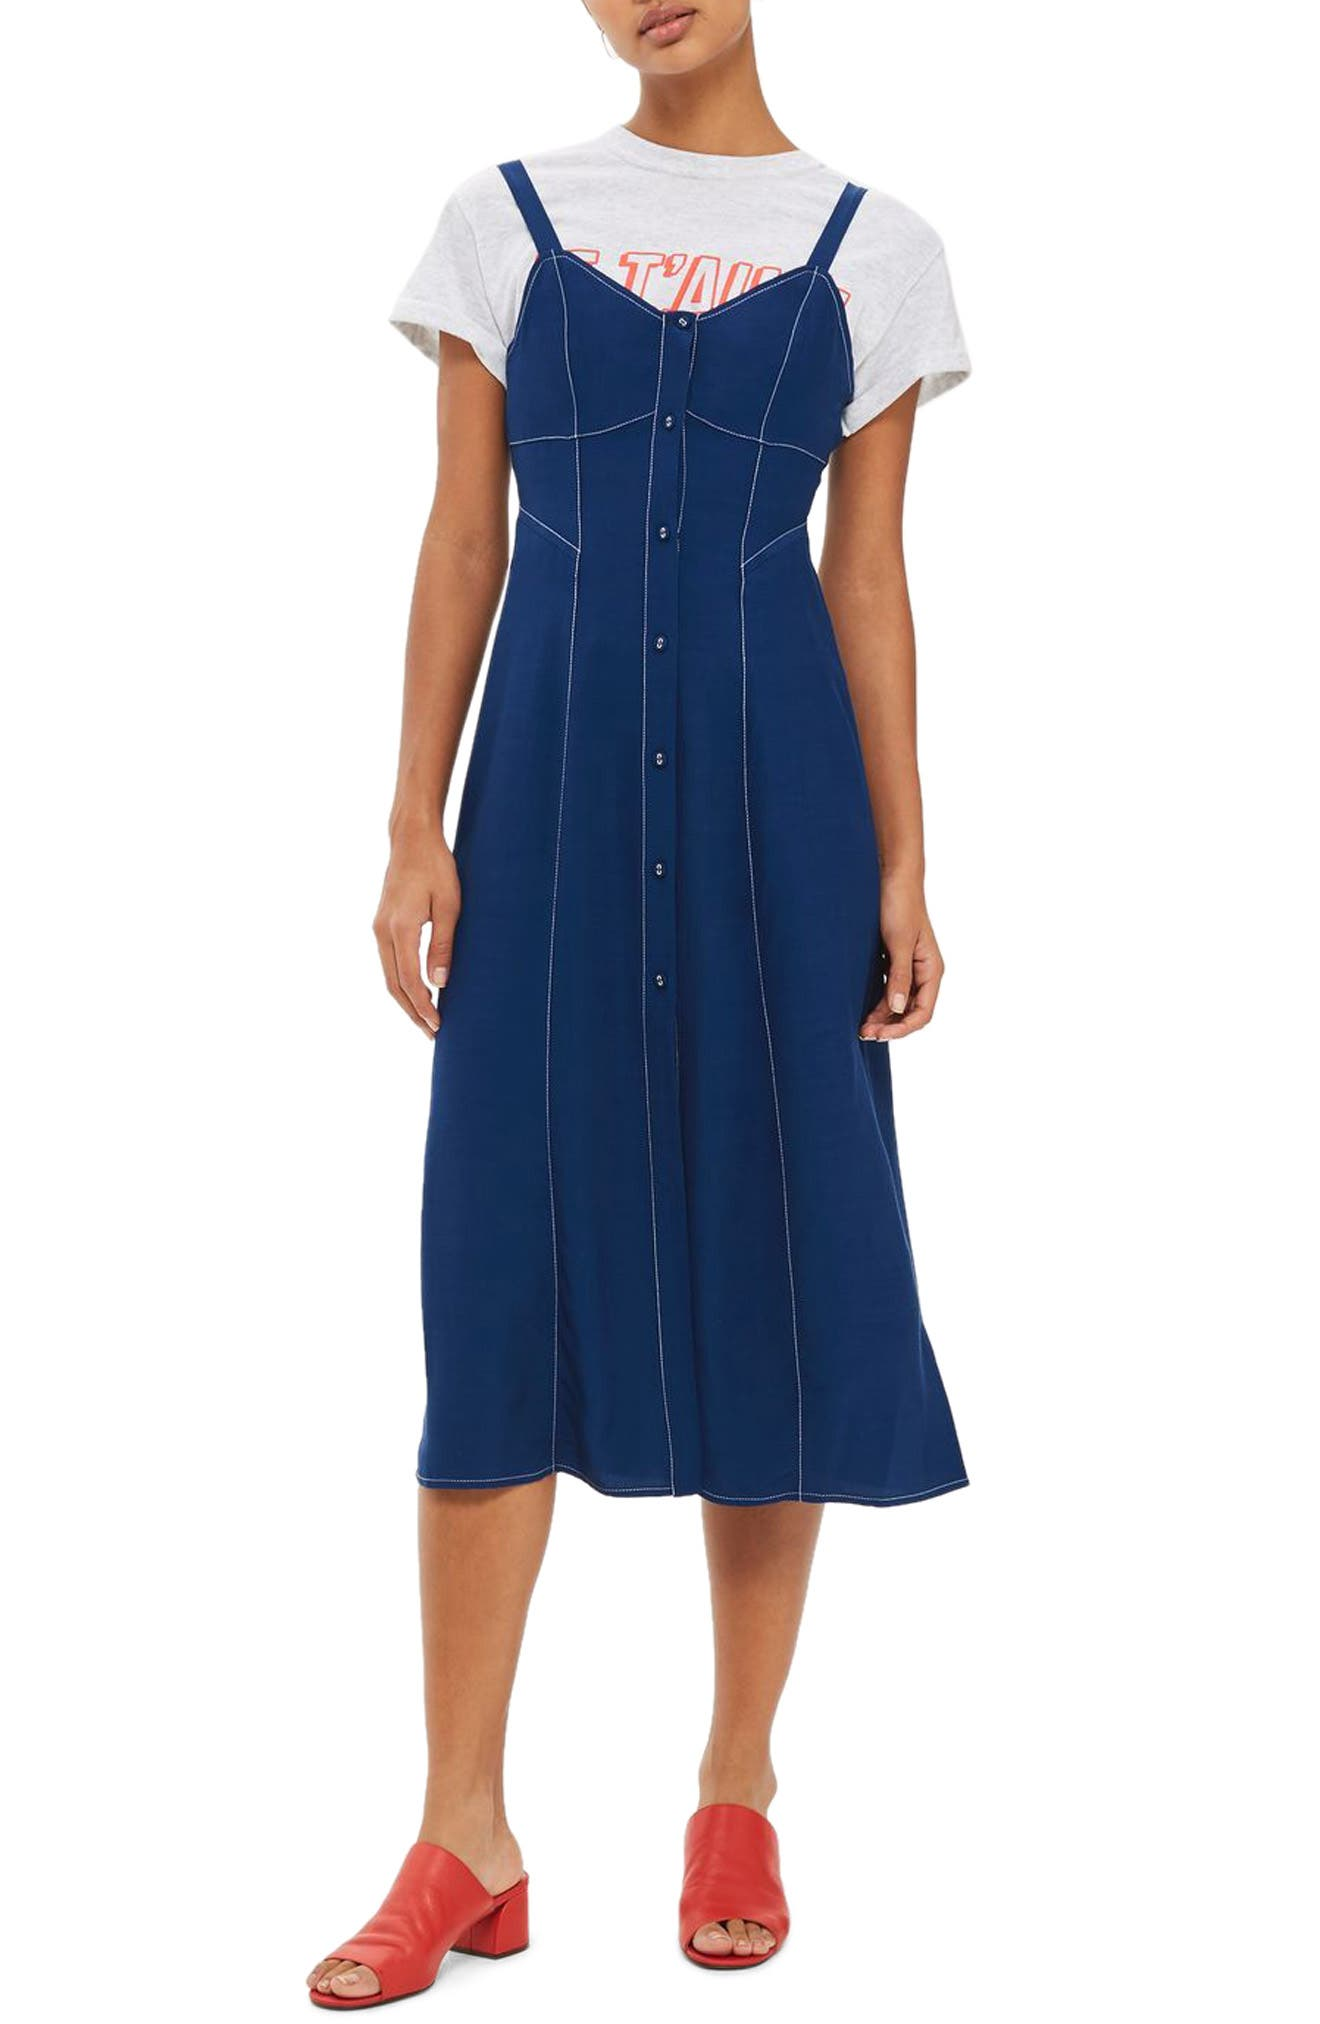 Topstitch Corset Midi Dress,                             Main thumbnail 1, color,                             410